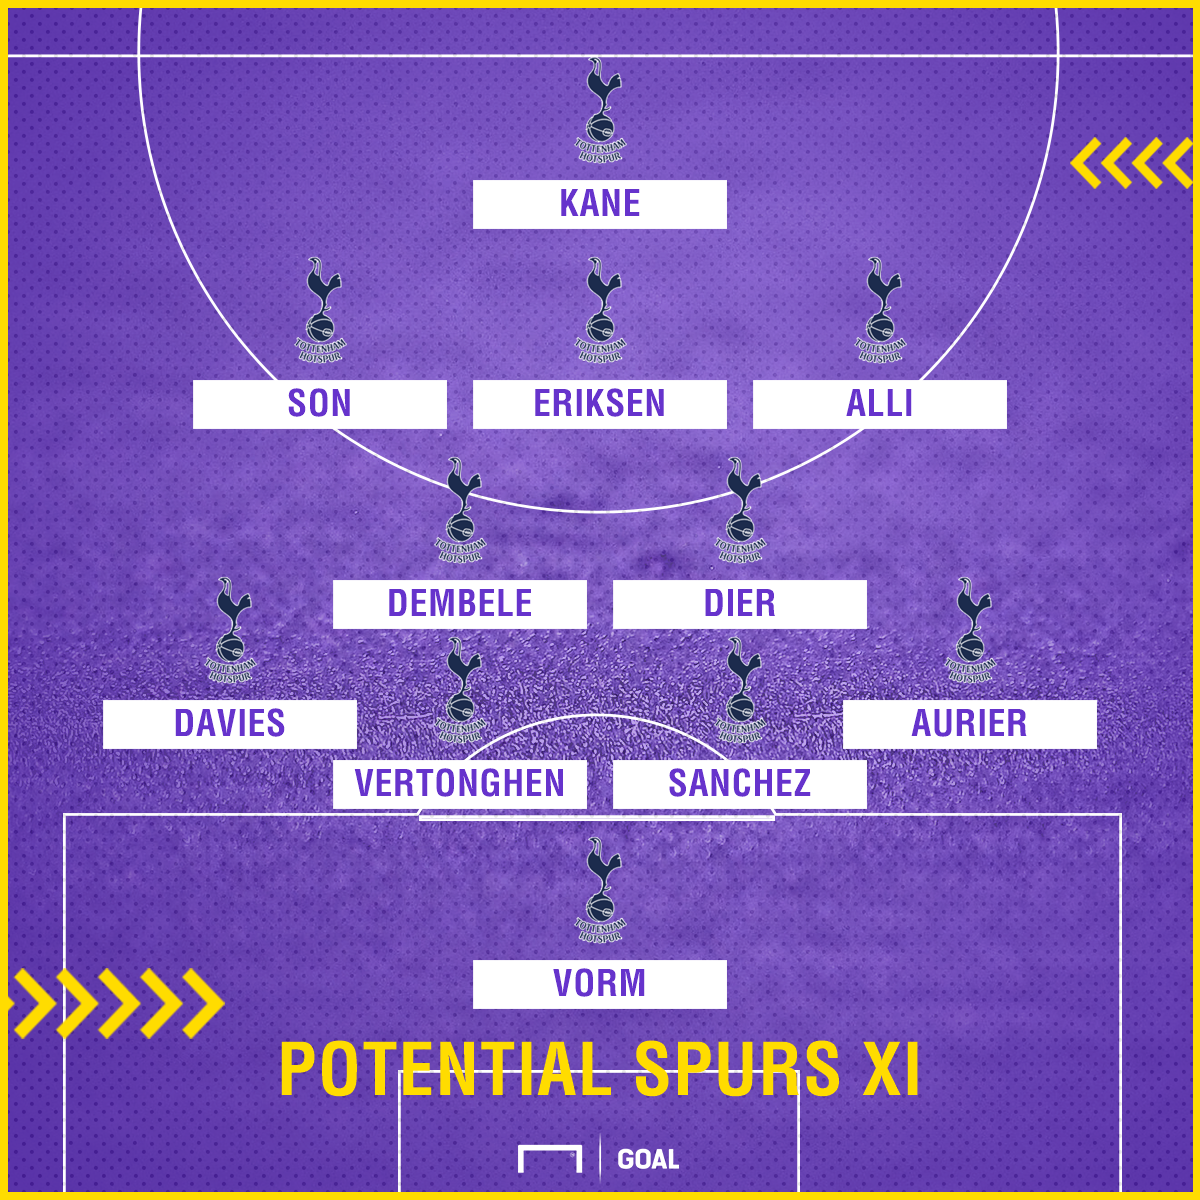 Spurs potential XI